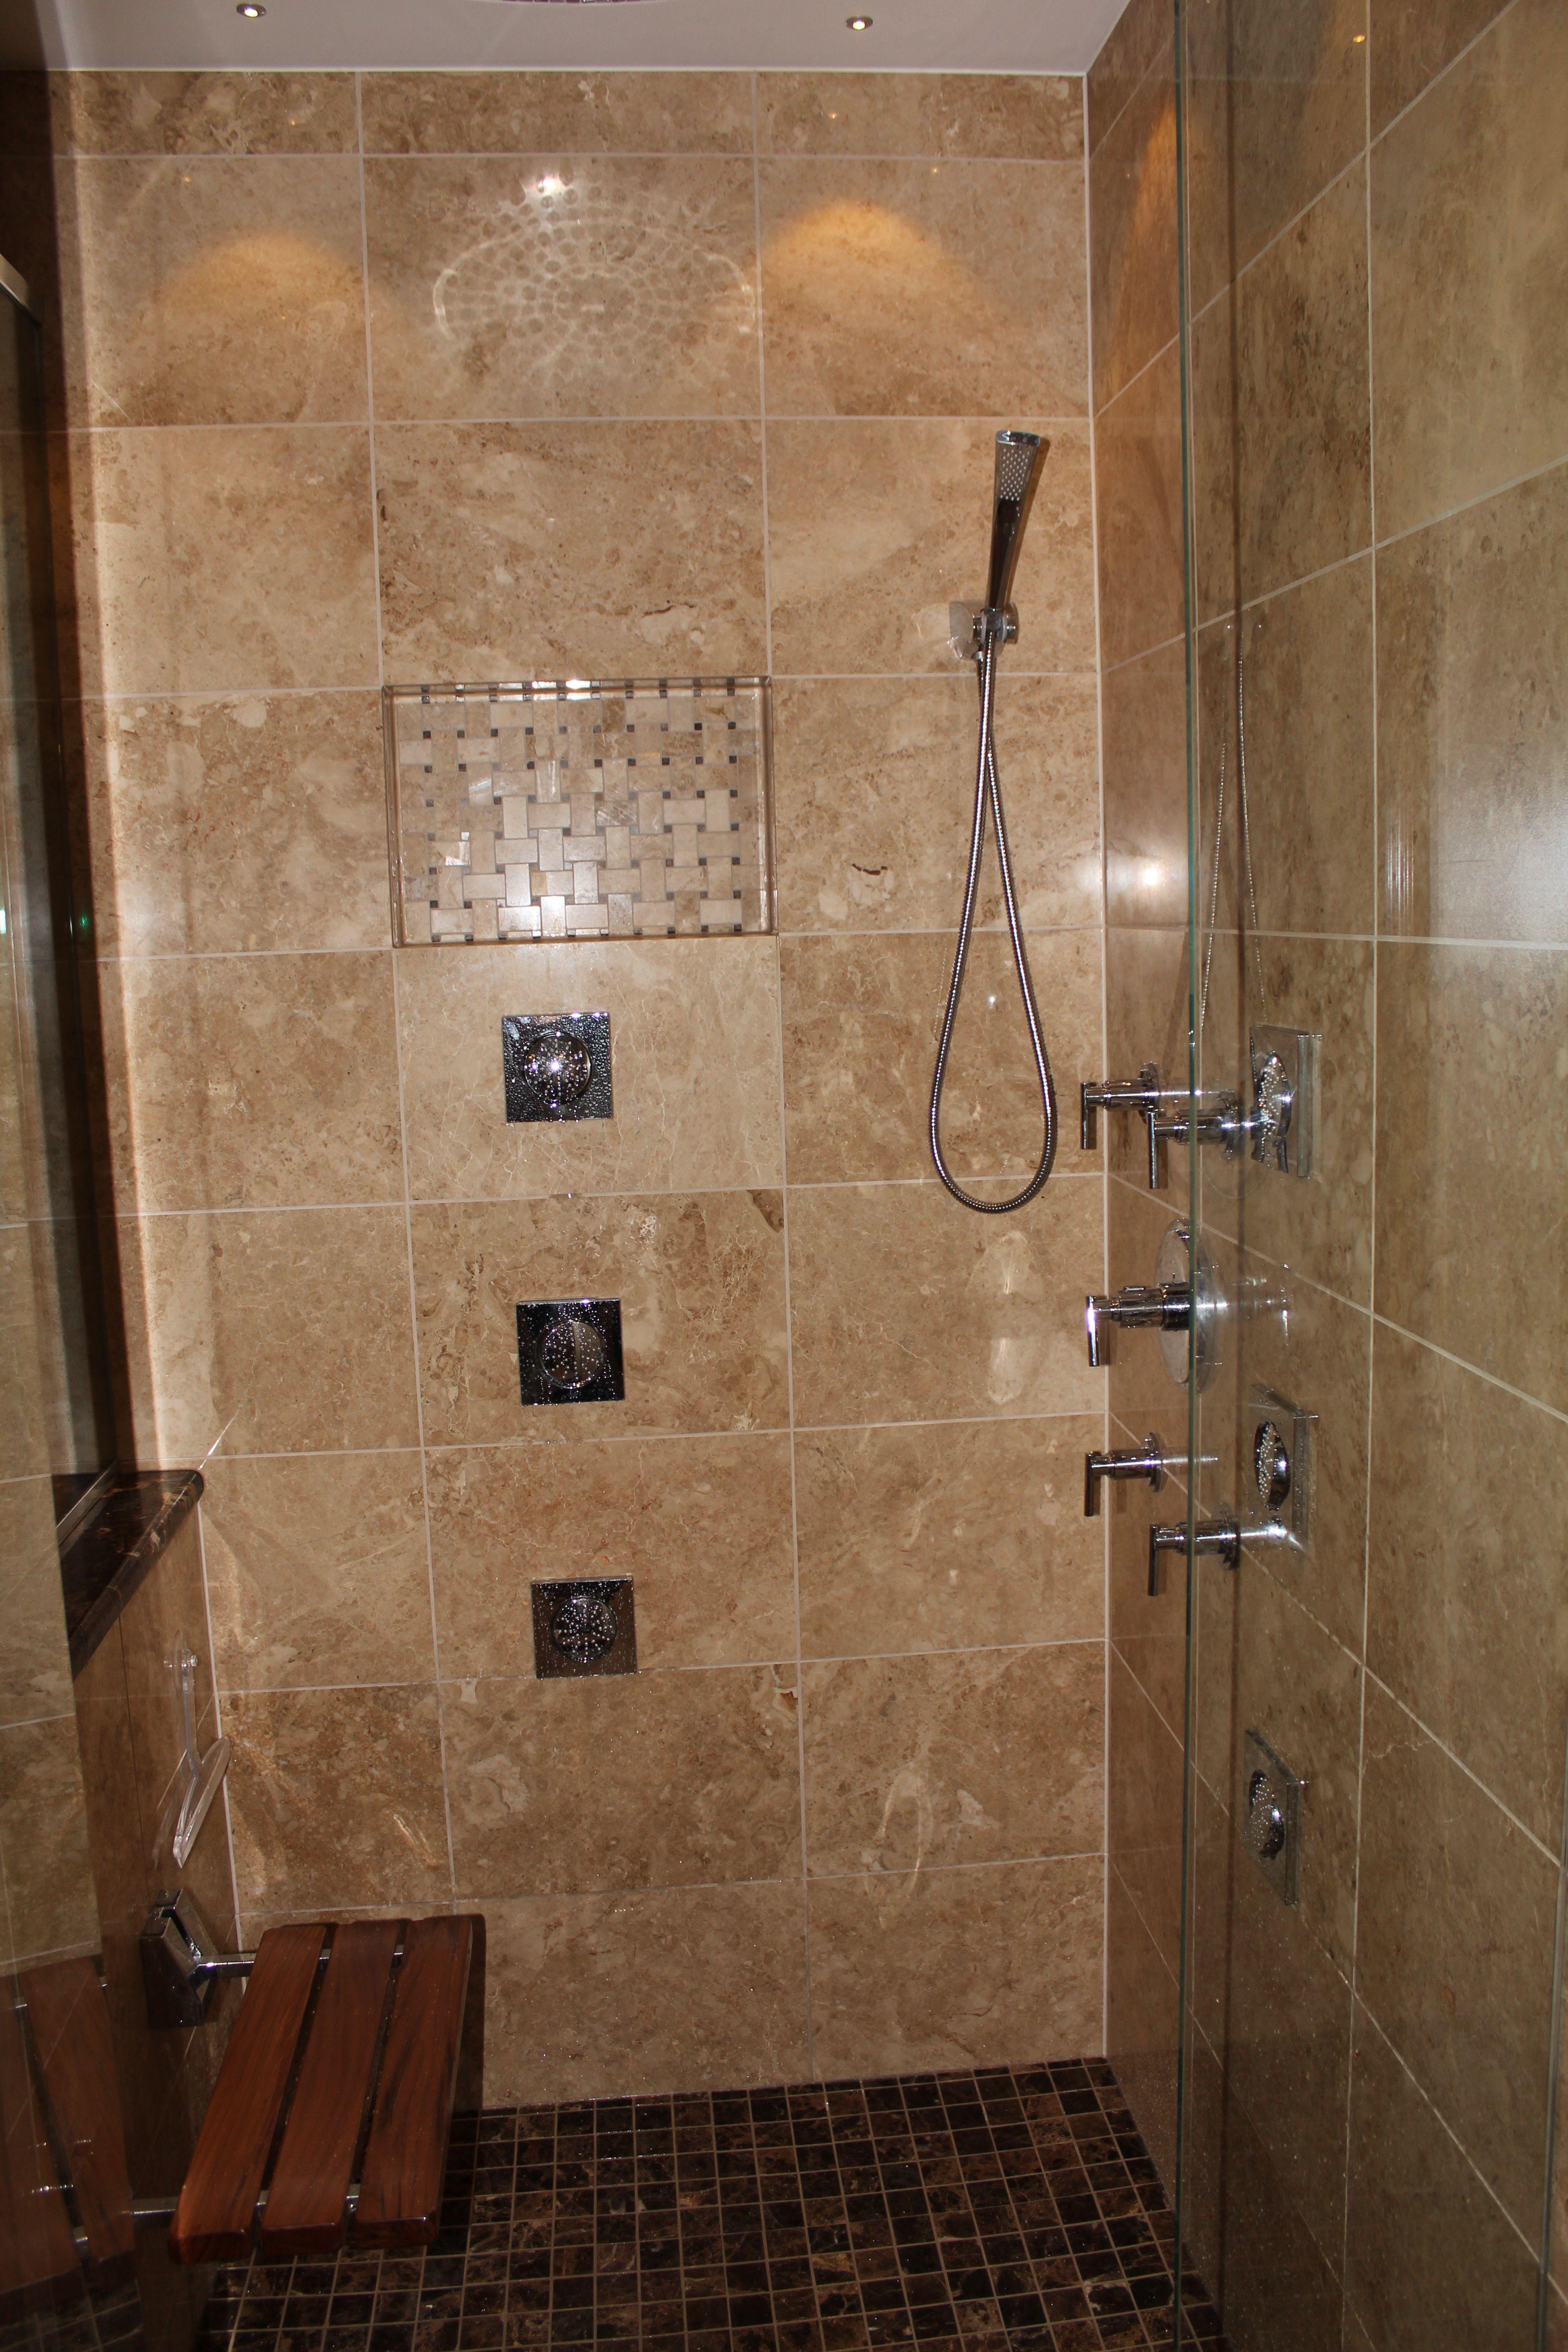 bathroom classic design. Classic Design With A Modern Twist. Bathroom Remodel By @GreenLivingDesigns #GreenLivingDesigns #shower #bathroom #bathroomremodel L